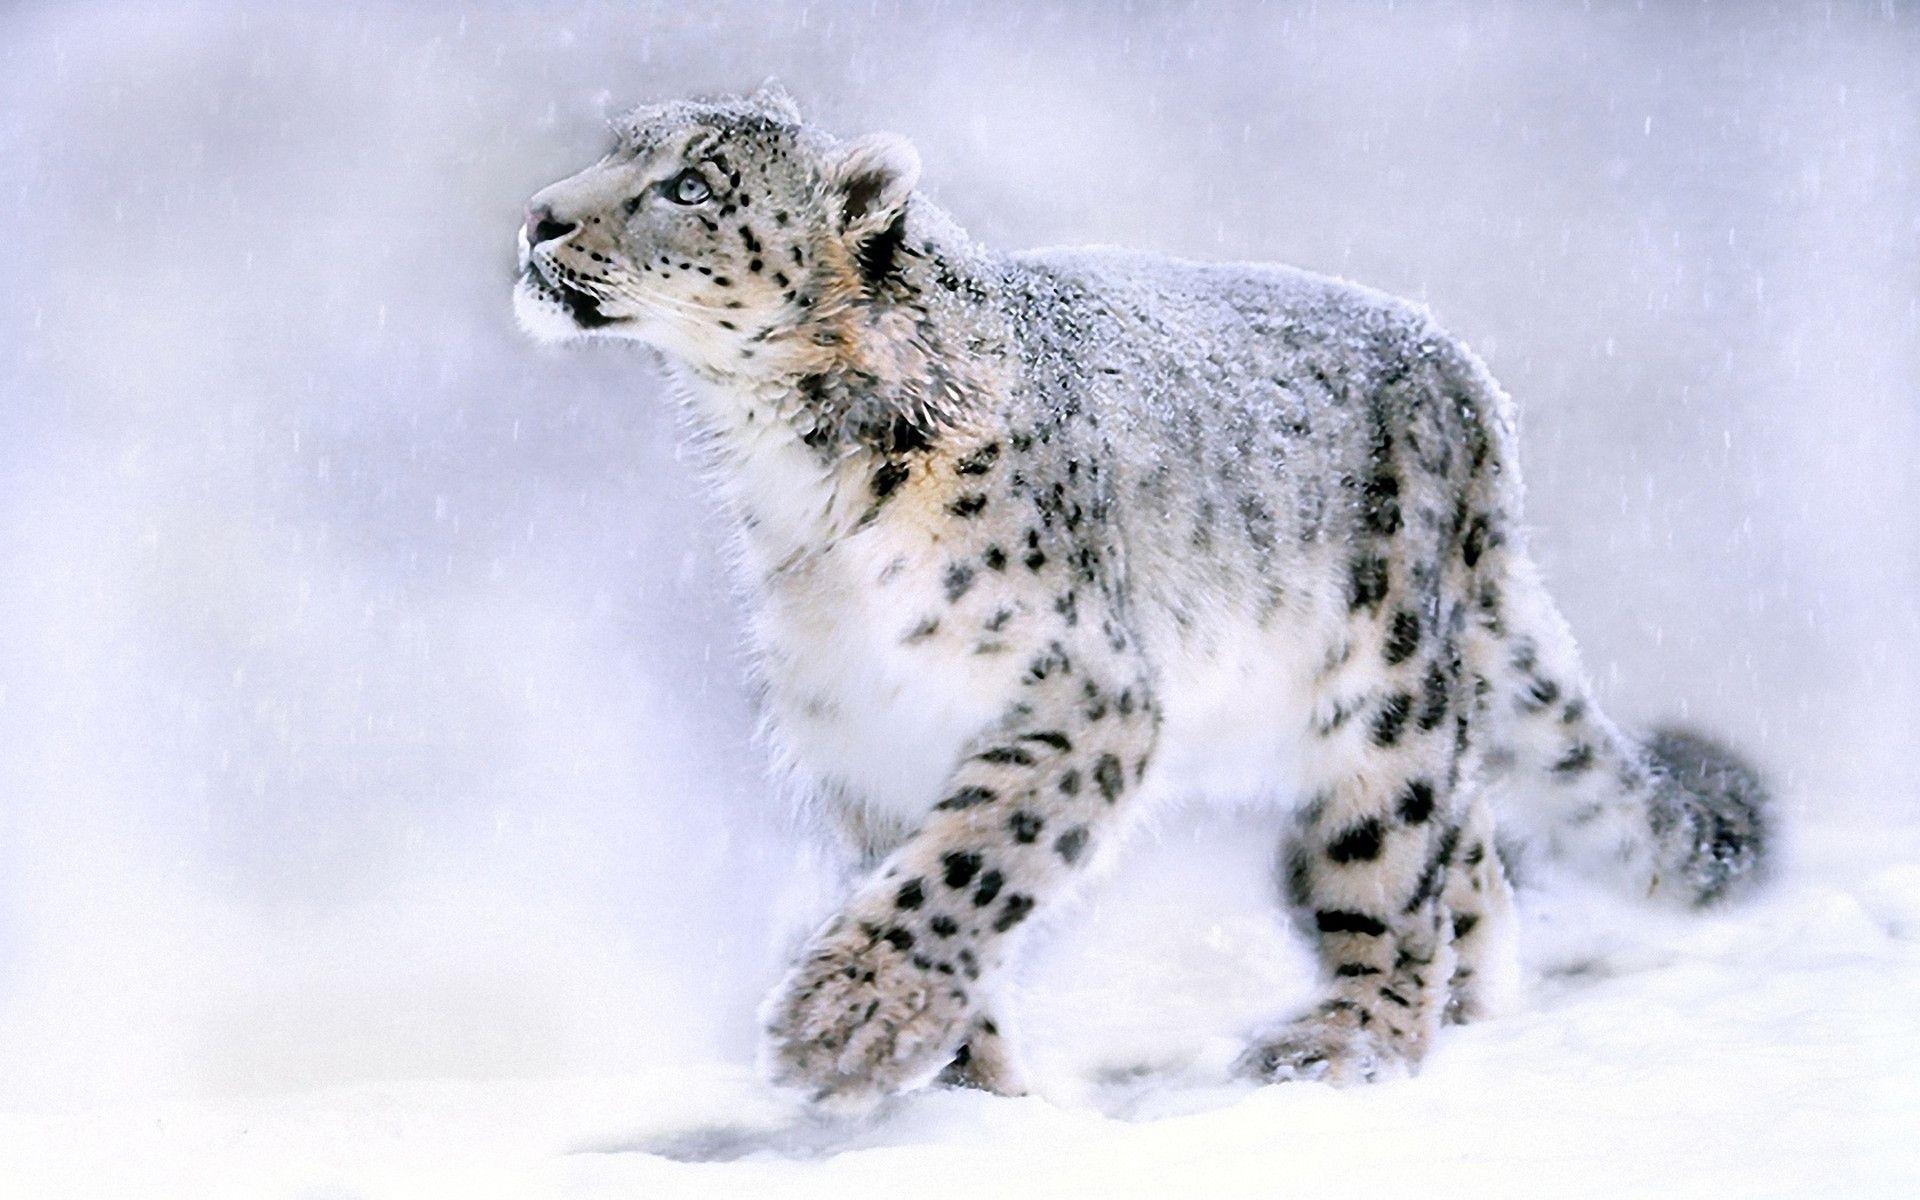 white cheetah wallpaper hd - photo #16